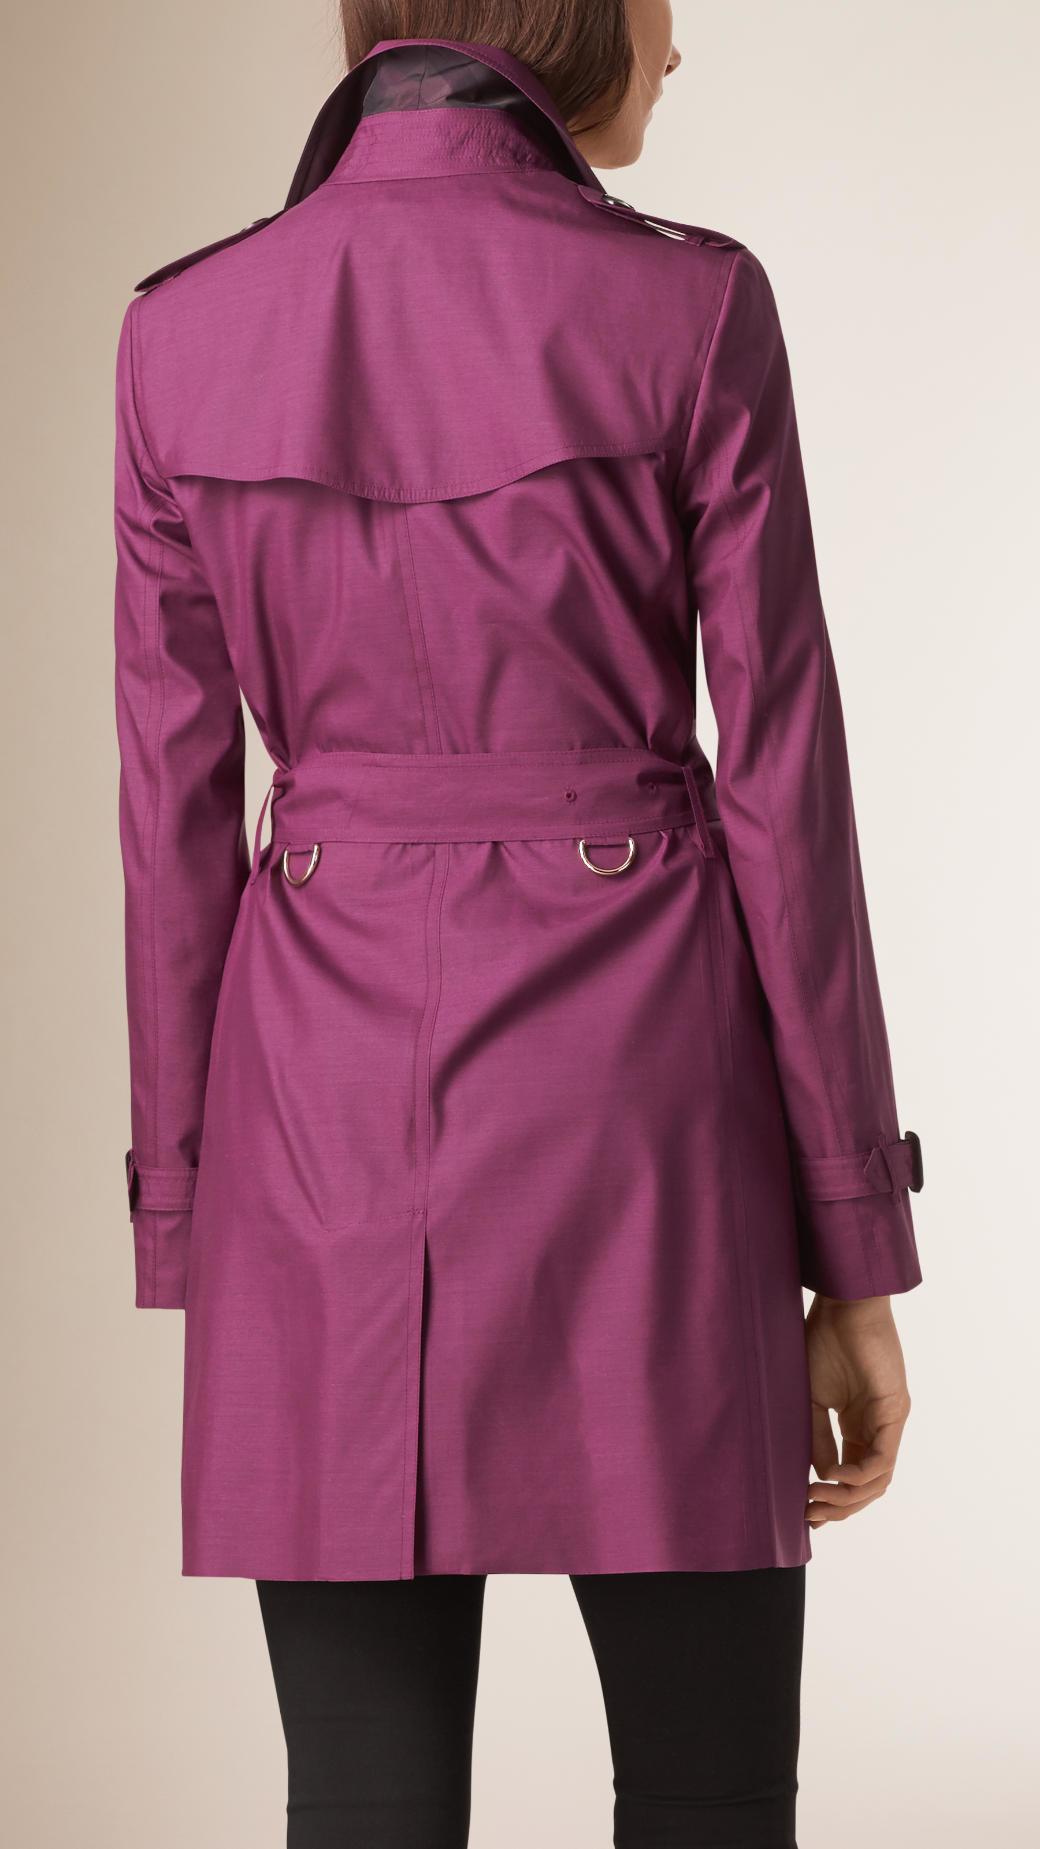 Burberry Silk Wool Trench Coat Bright Burgundy In Purple